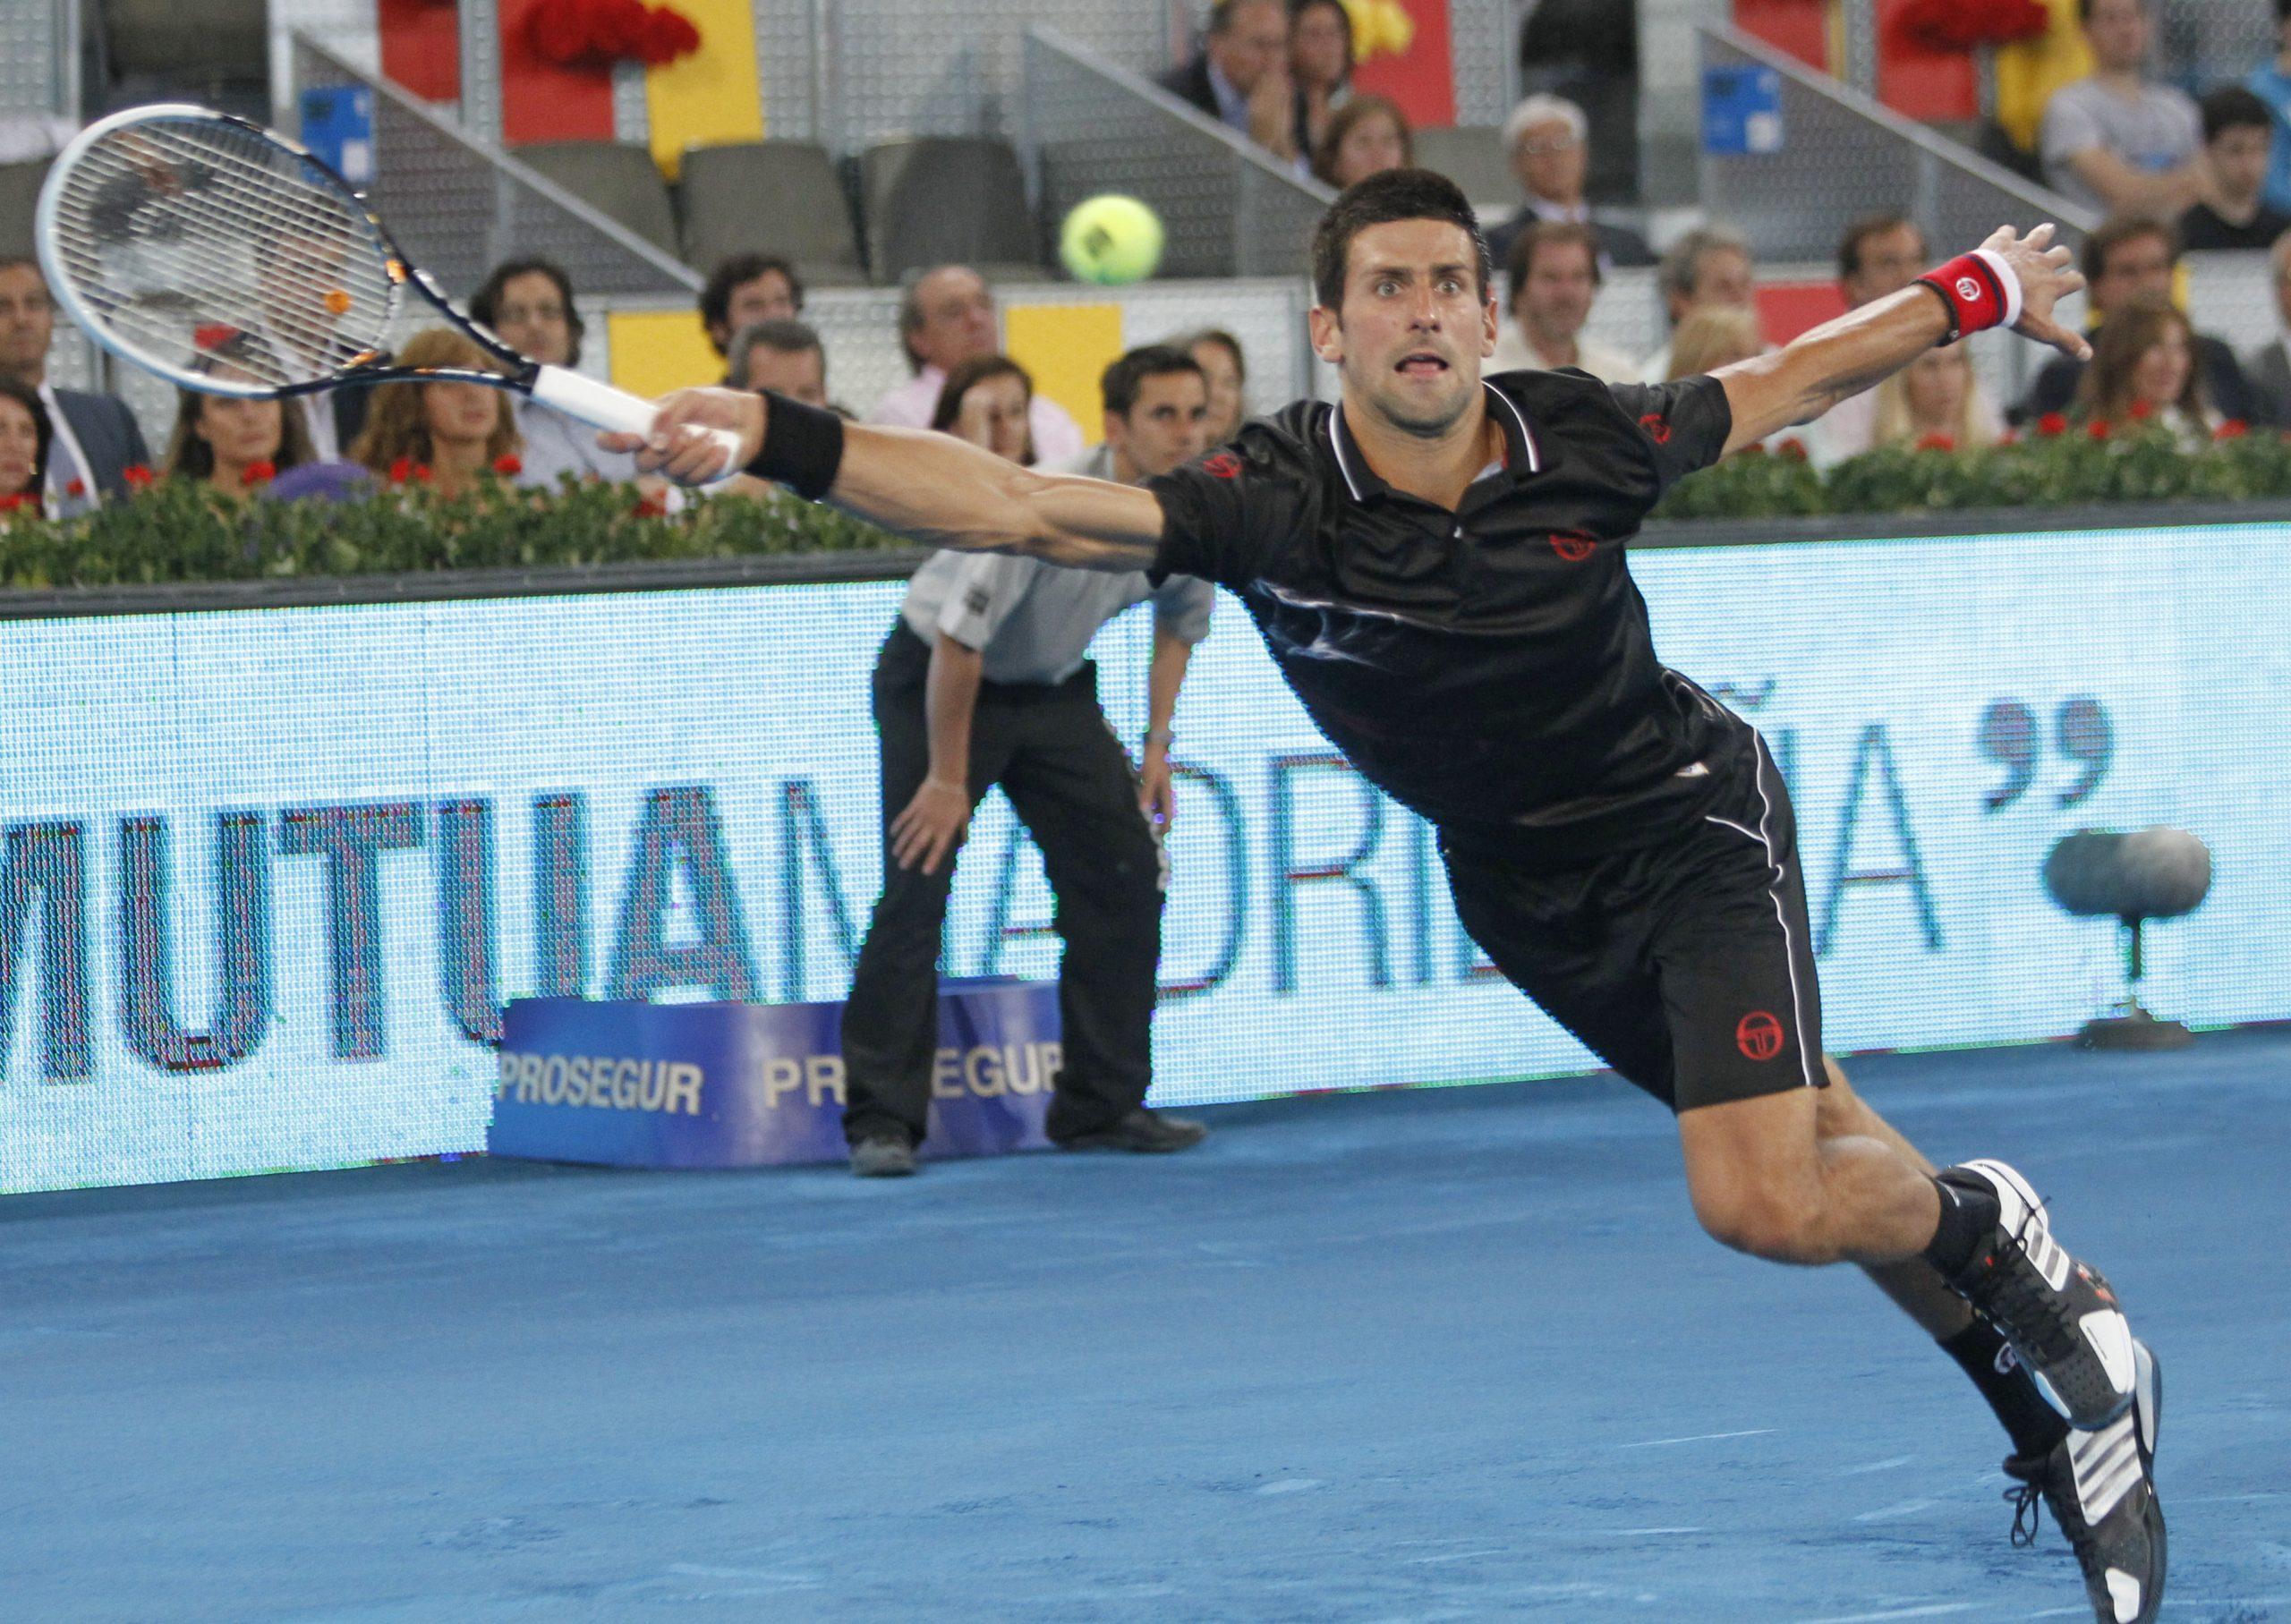 Novak Đoković Madrid 2012 plava šljaka